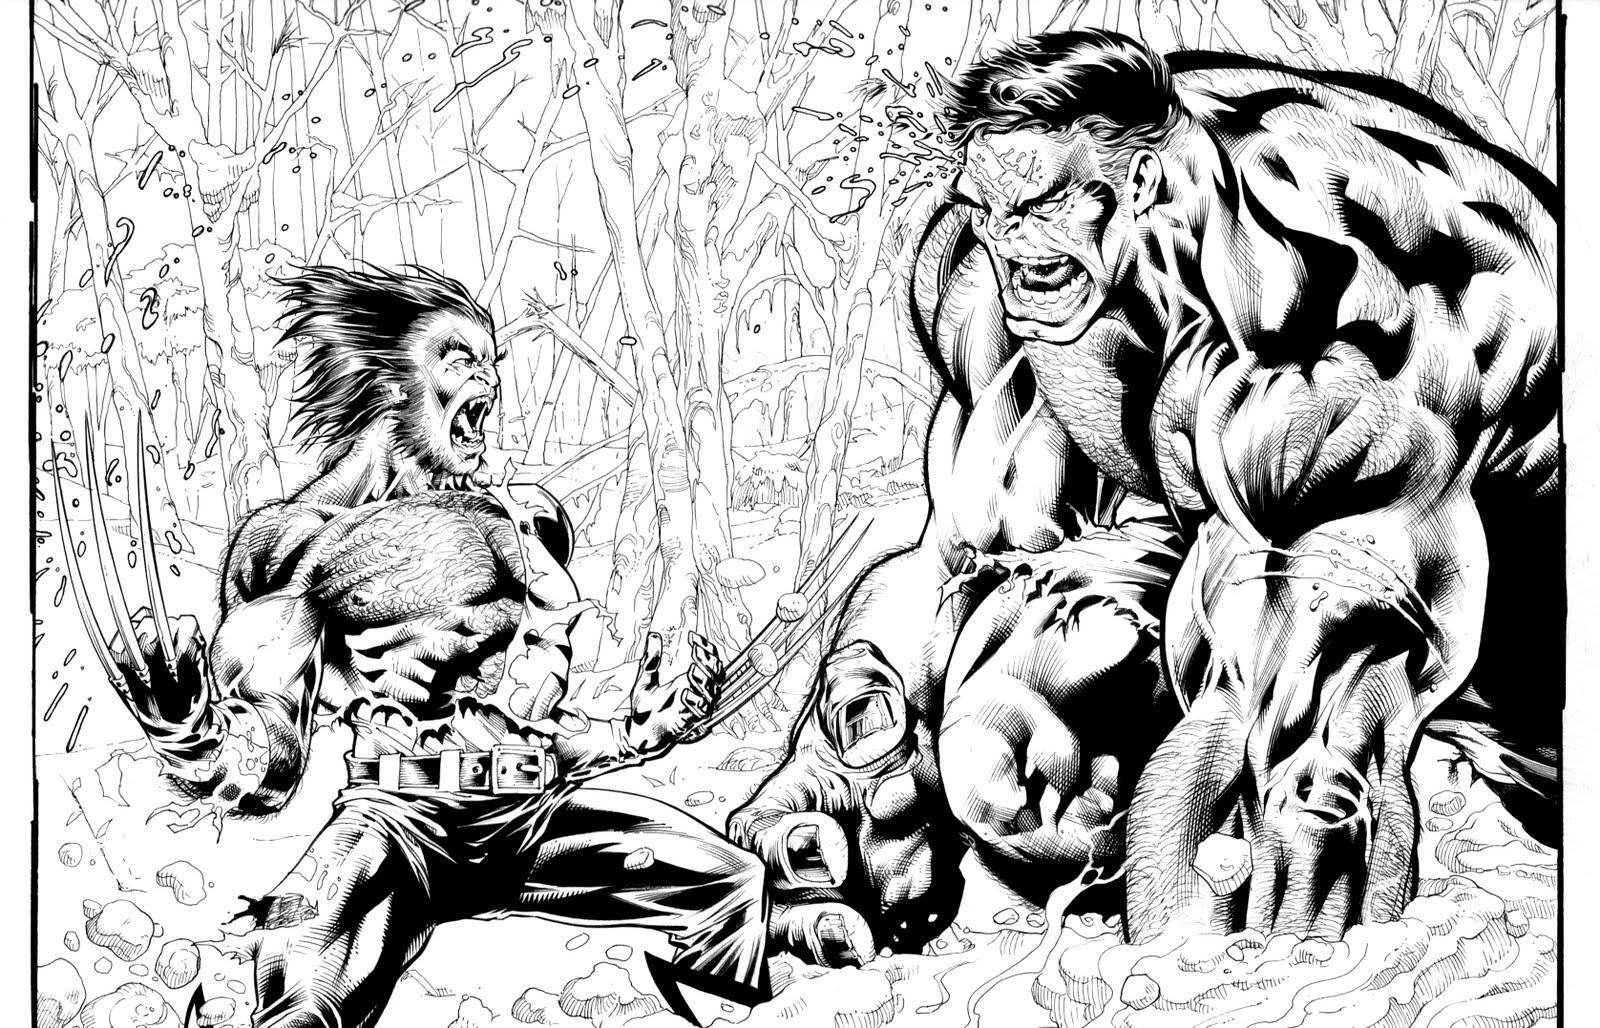 [Hulk+vs.+Wolverine+inks+lowRez]